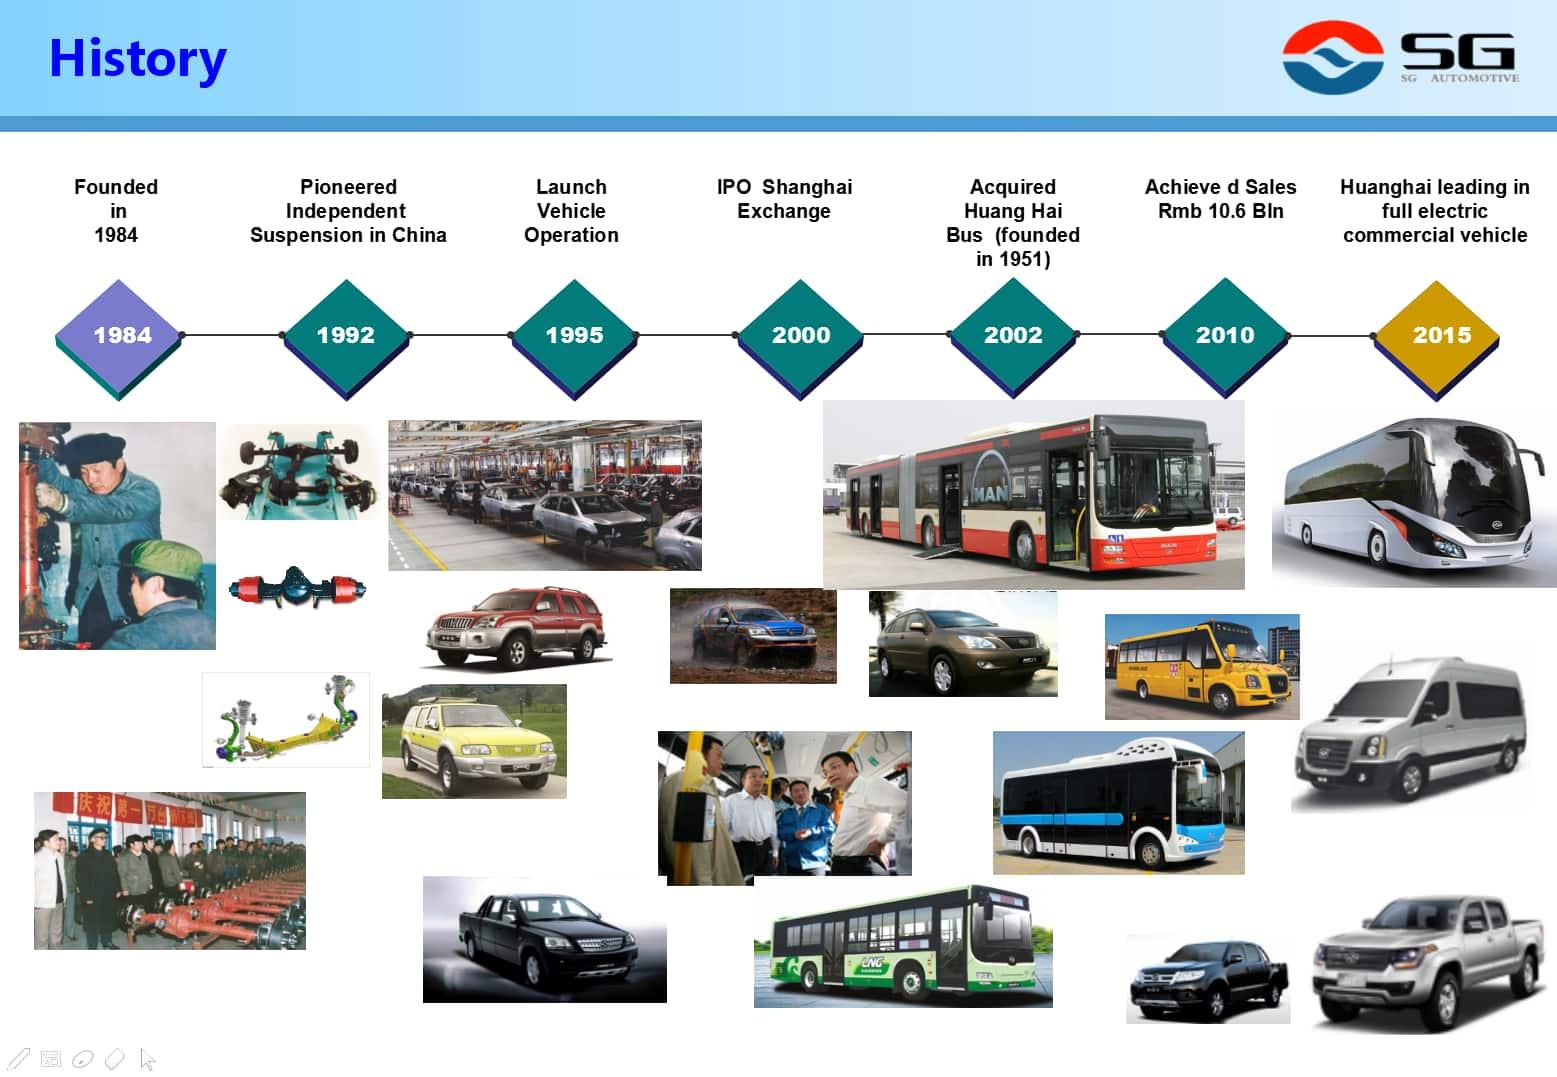 Huanghai Pick Up N2S-R134 4WD Gasoline 4G69 Luxury